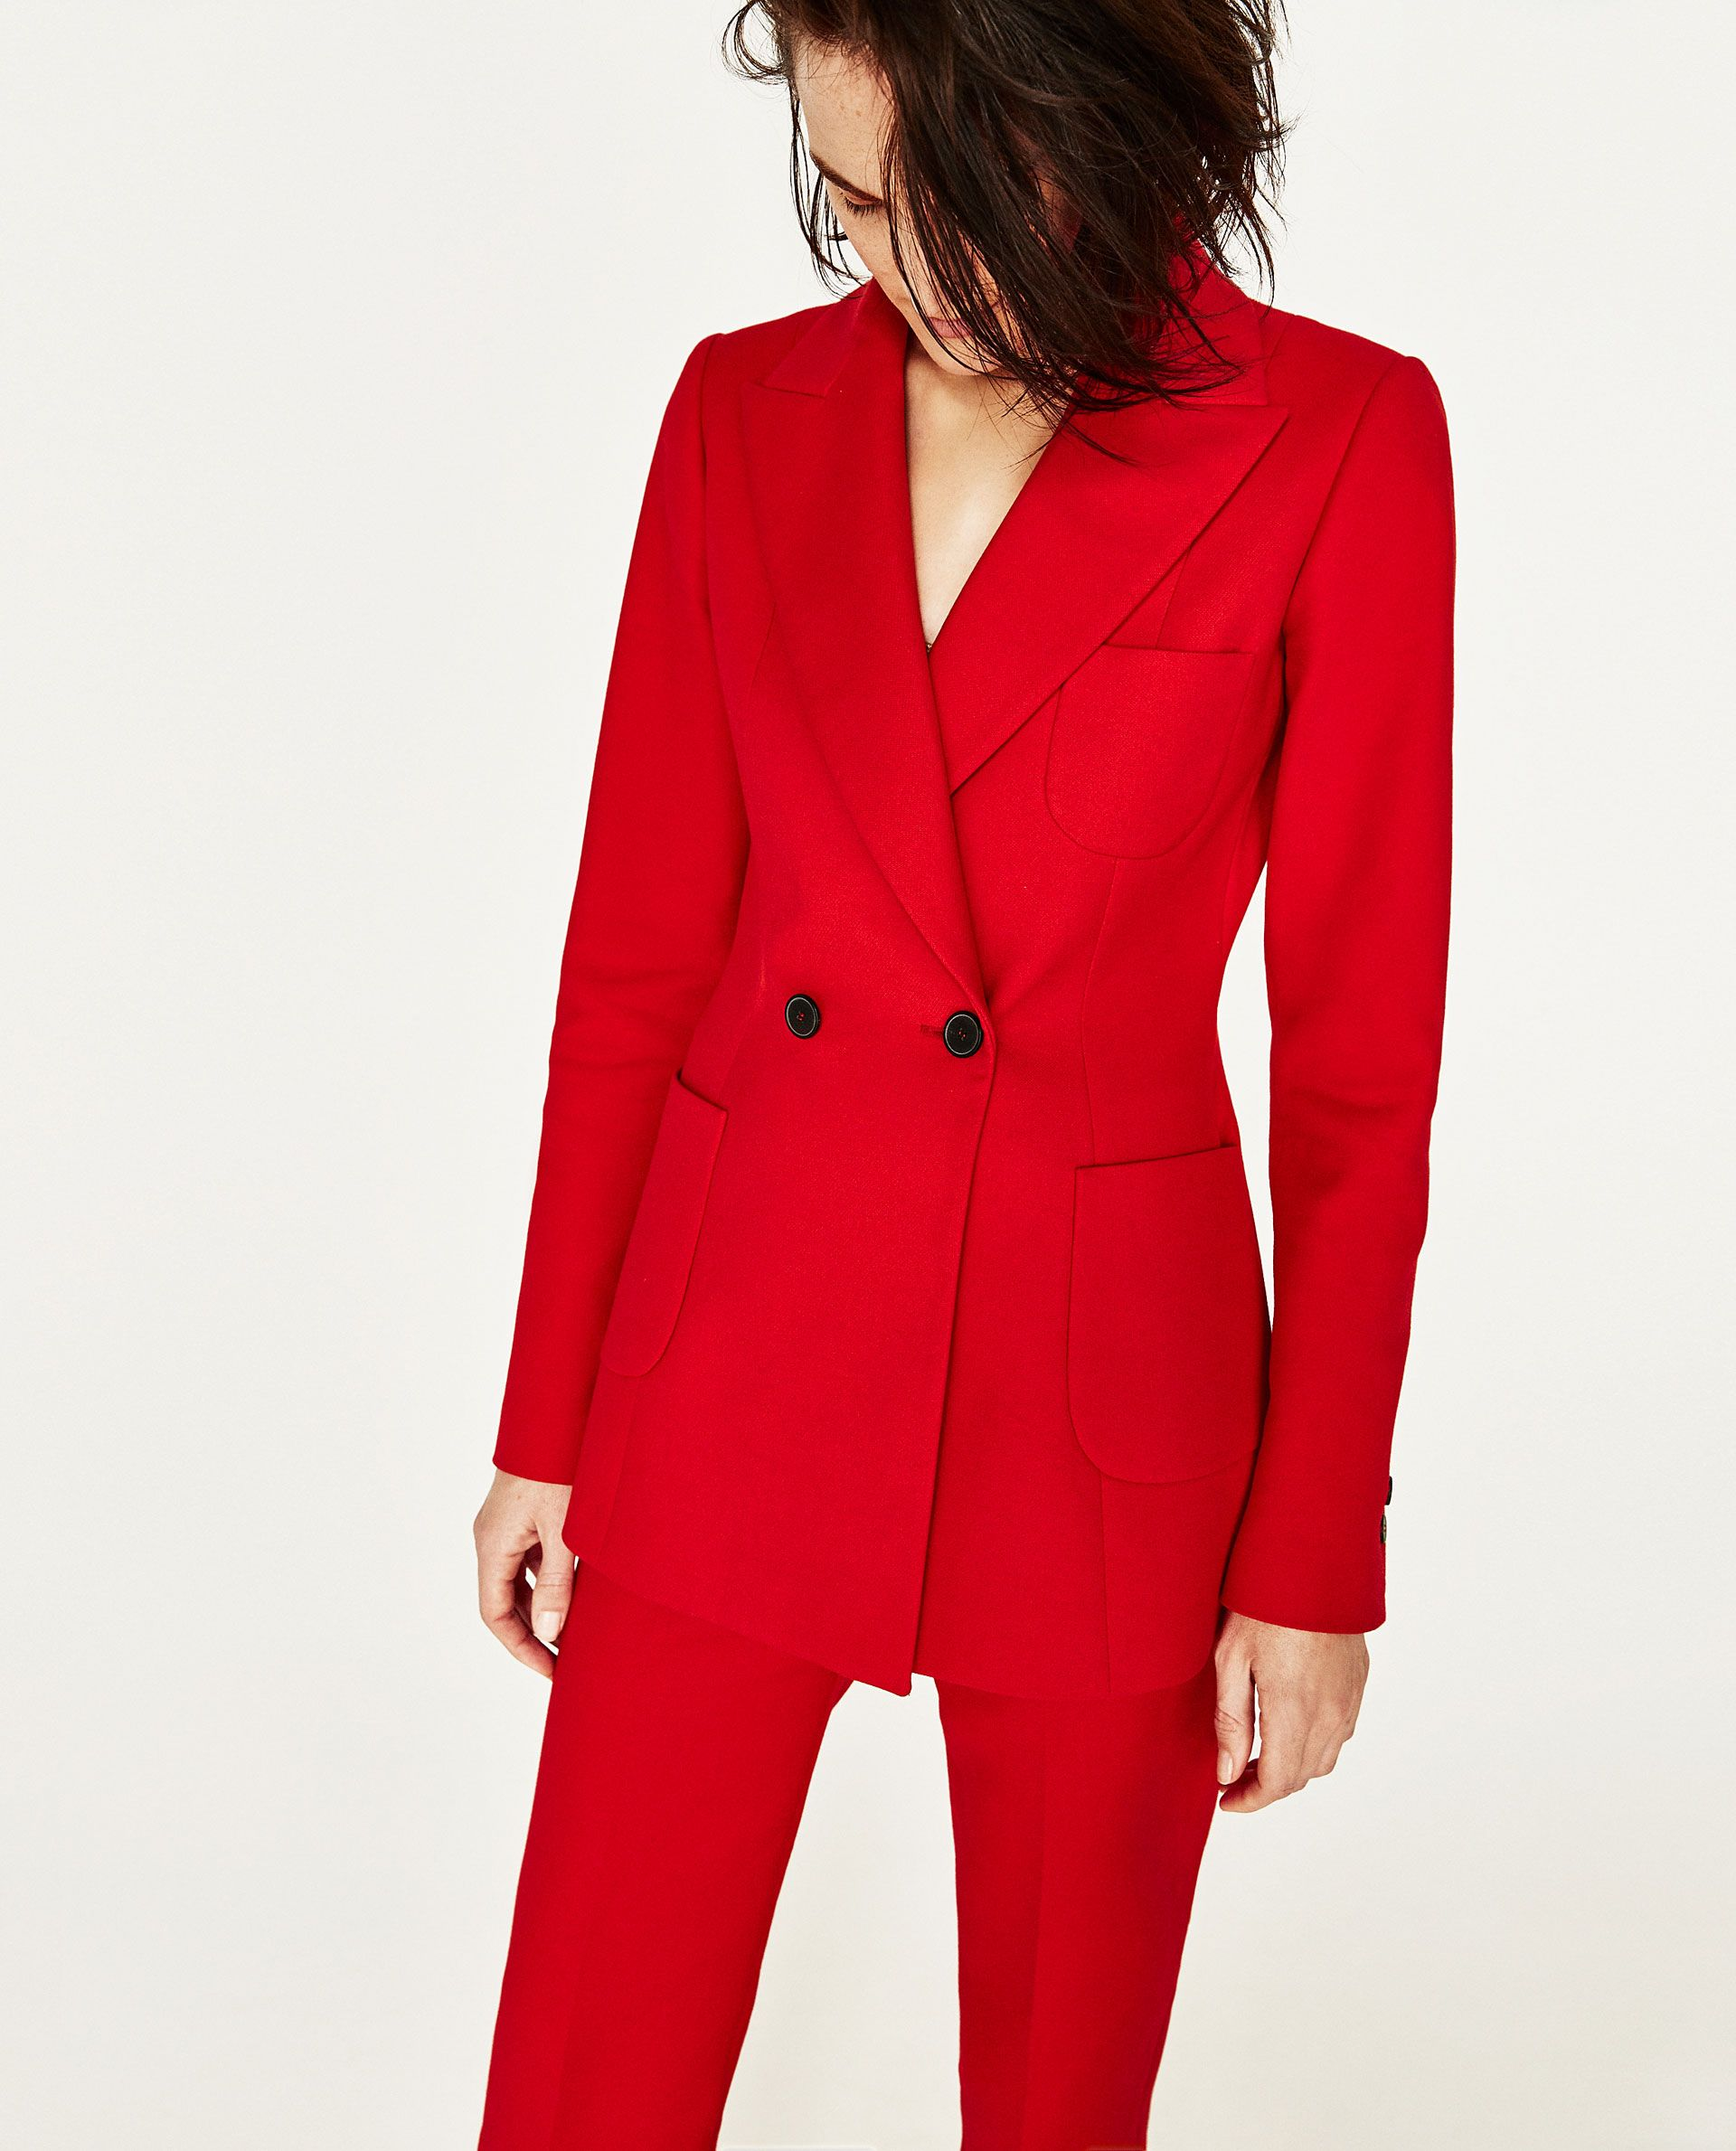 giacca rossa zara 2017